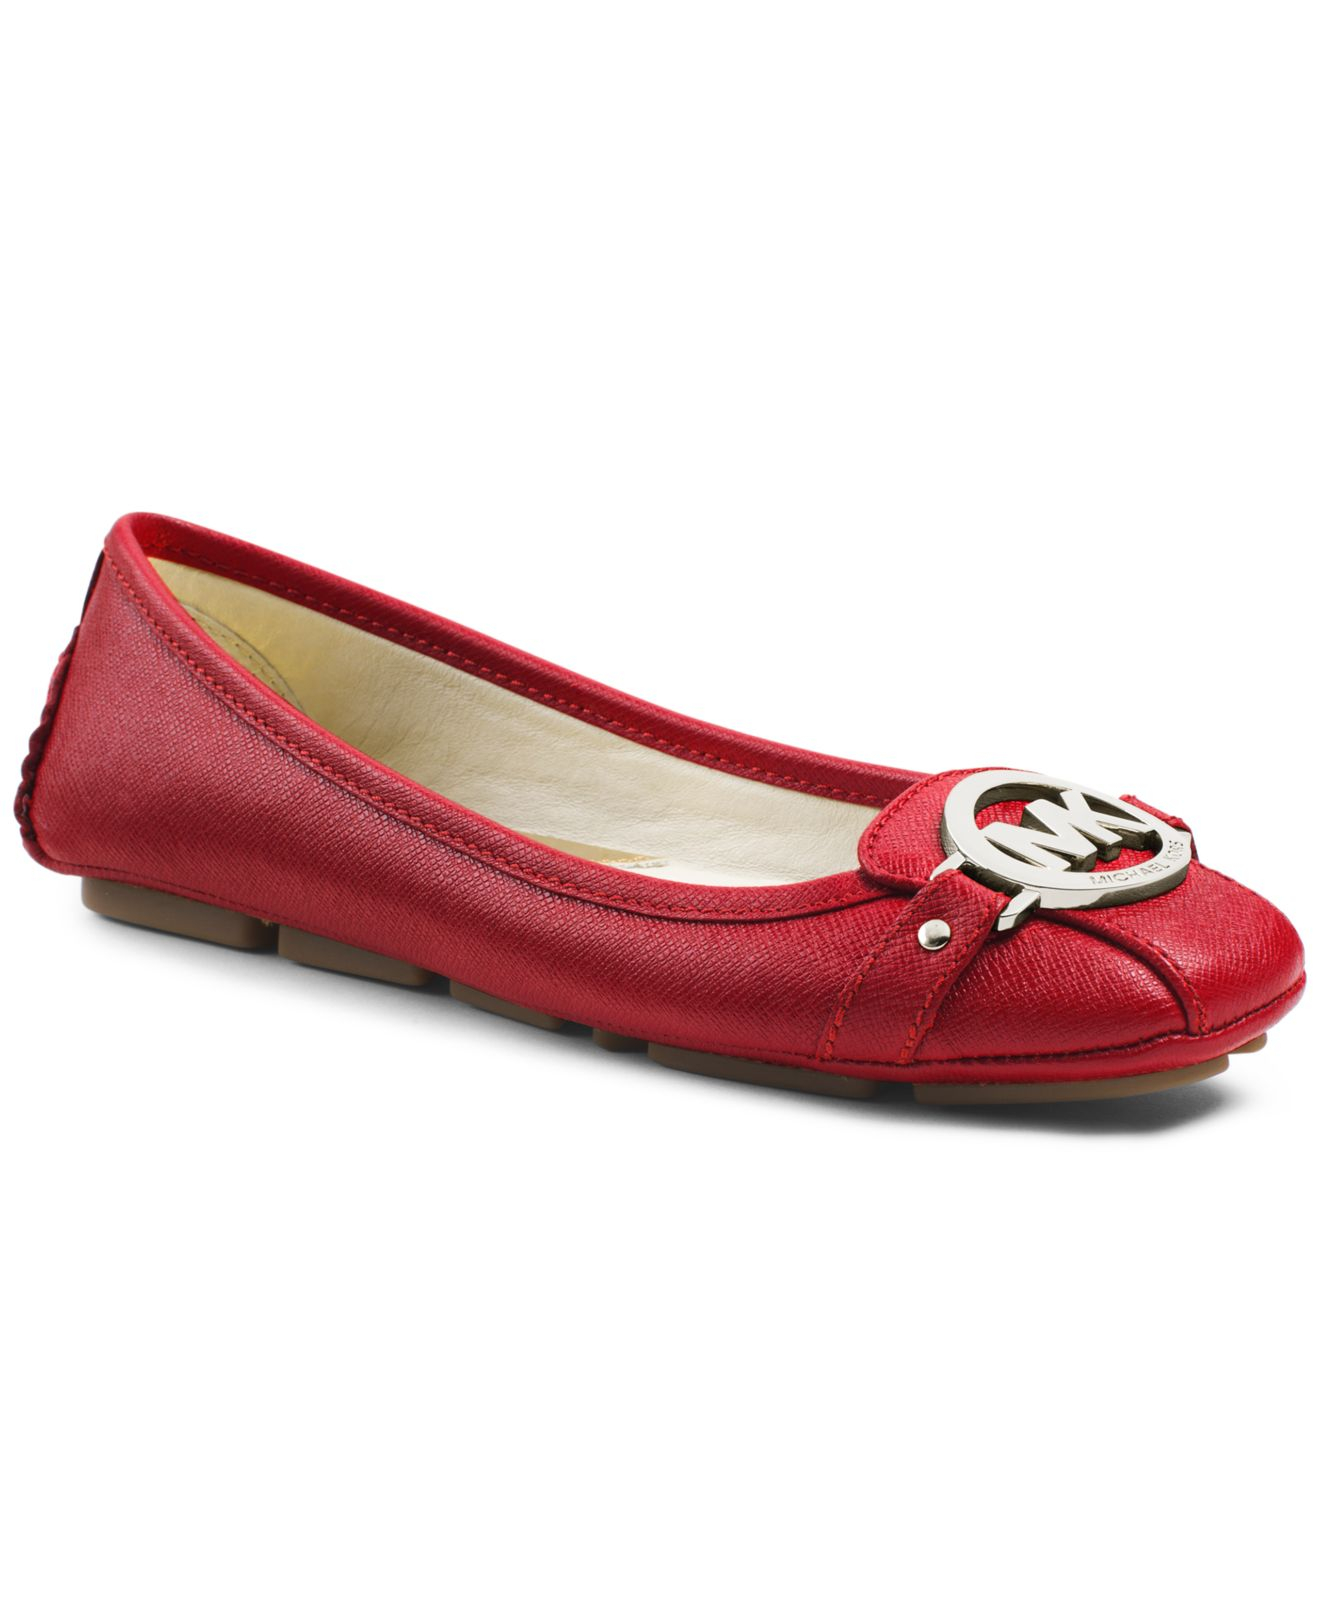 caeb261d989 Lyst - Michael Kors Michael Fulton Moc Flats in Red